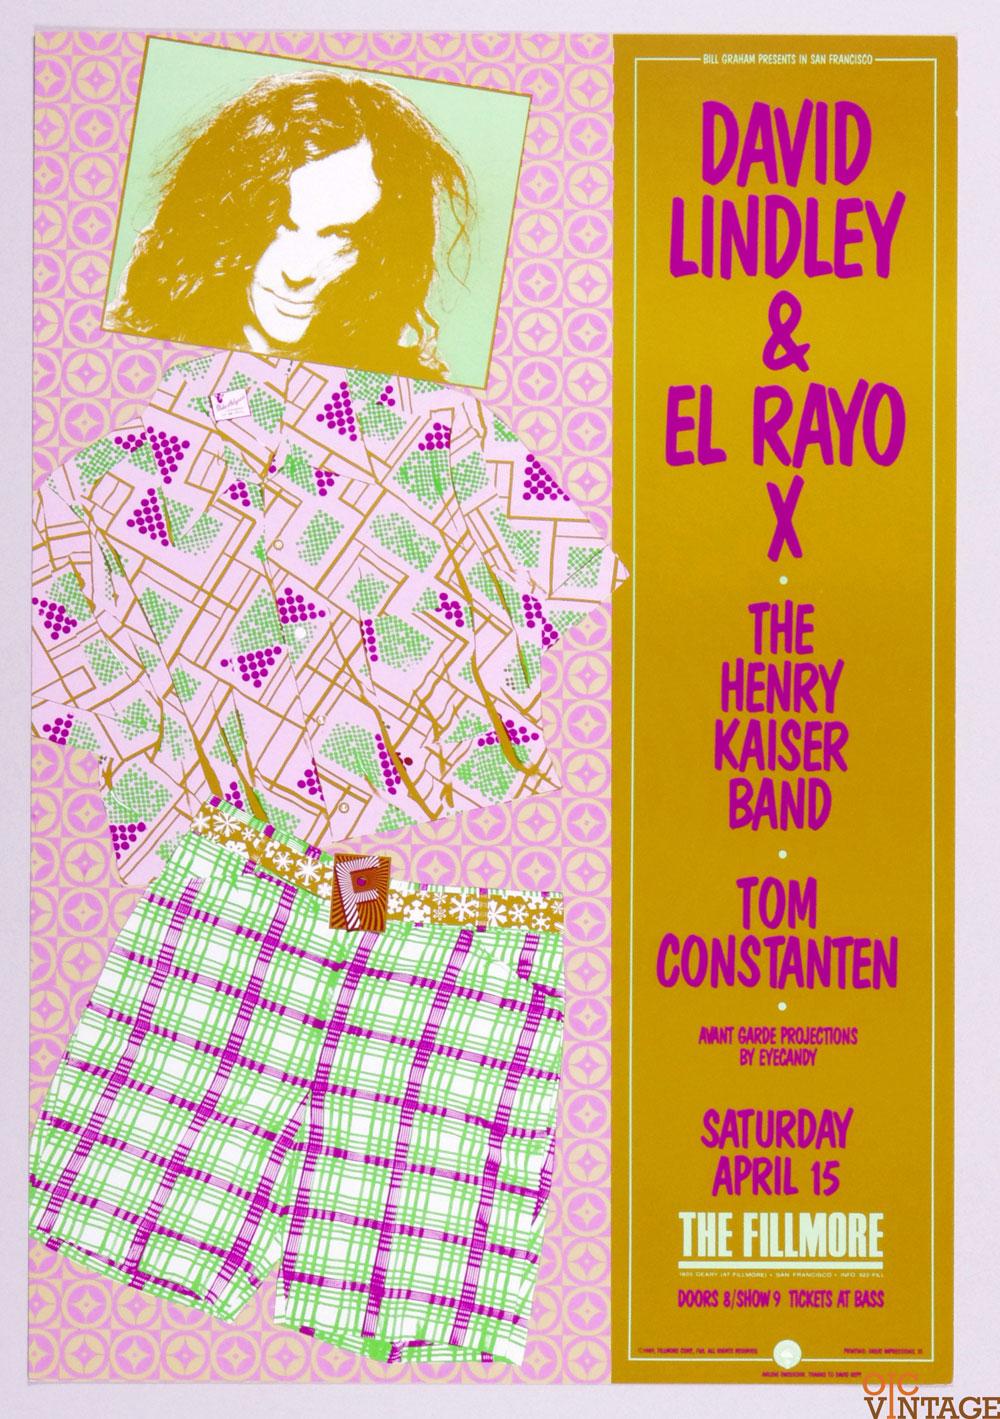 New Fillmore F088 Poster David Lindley El Rayo X Henry Kaiser band 1989 Apr 15